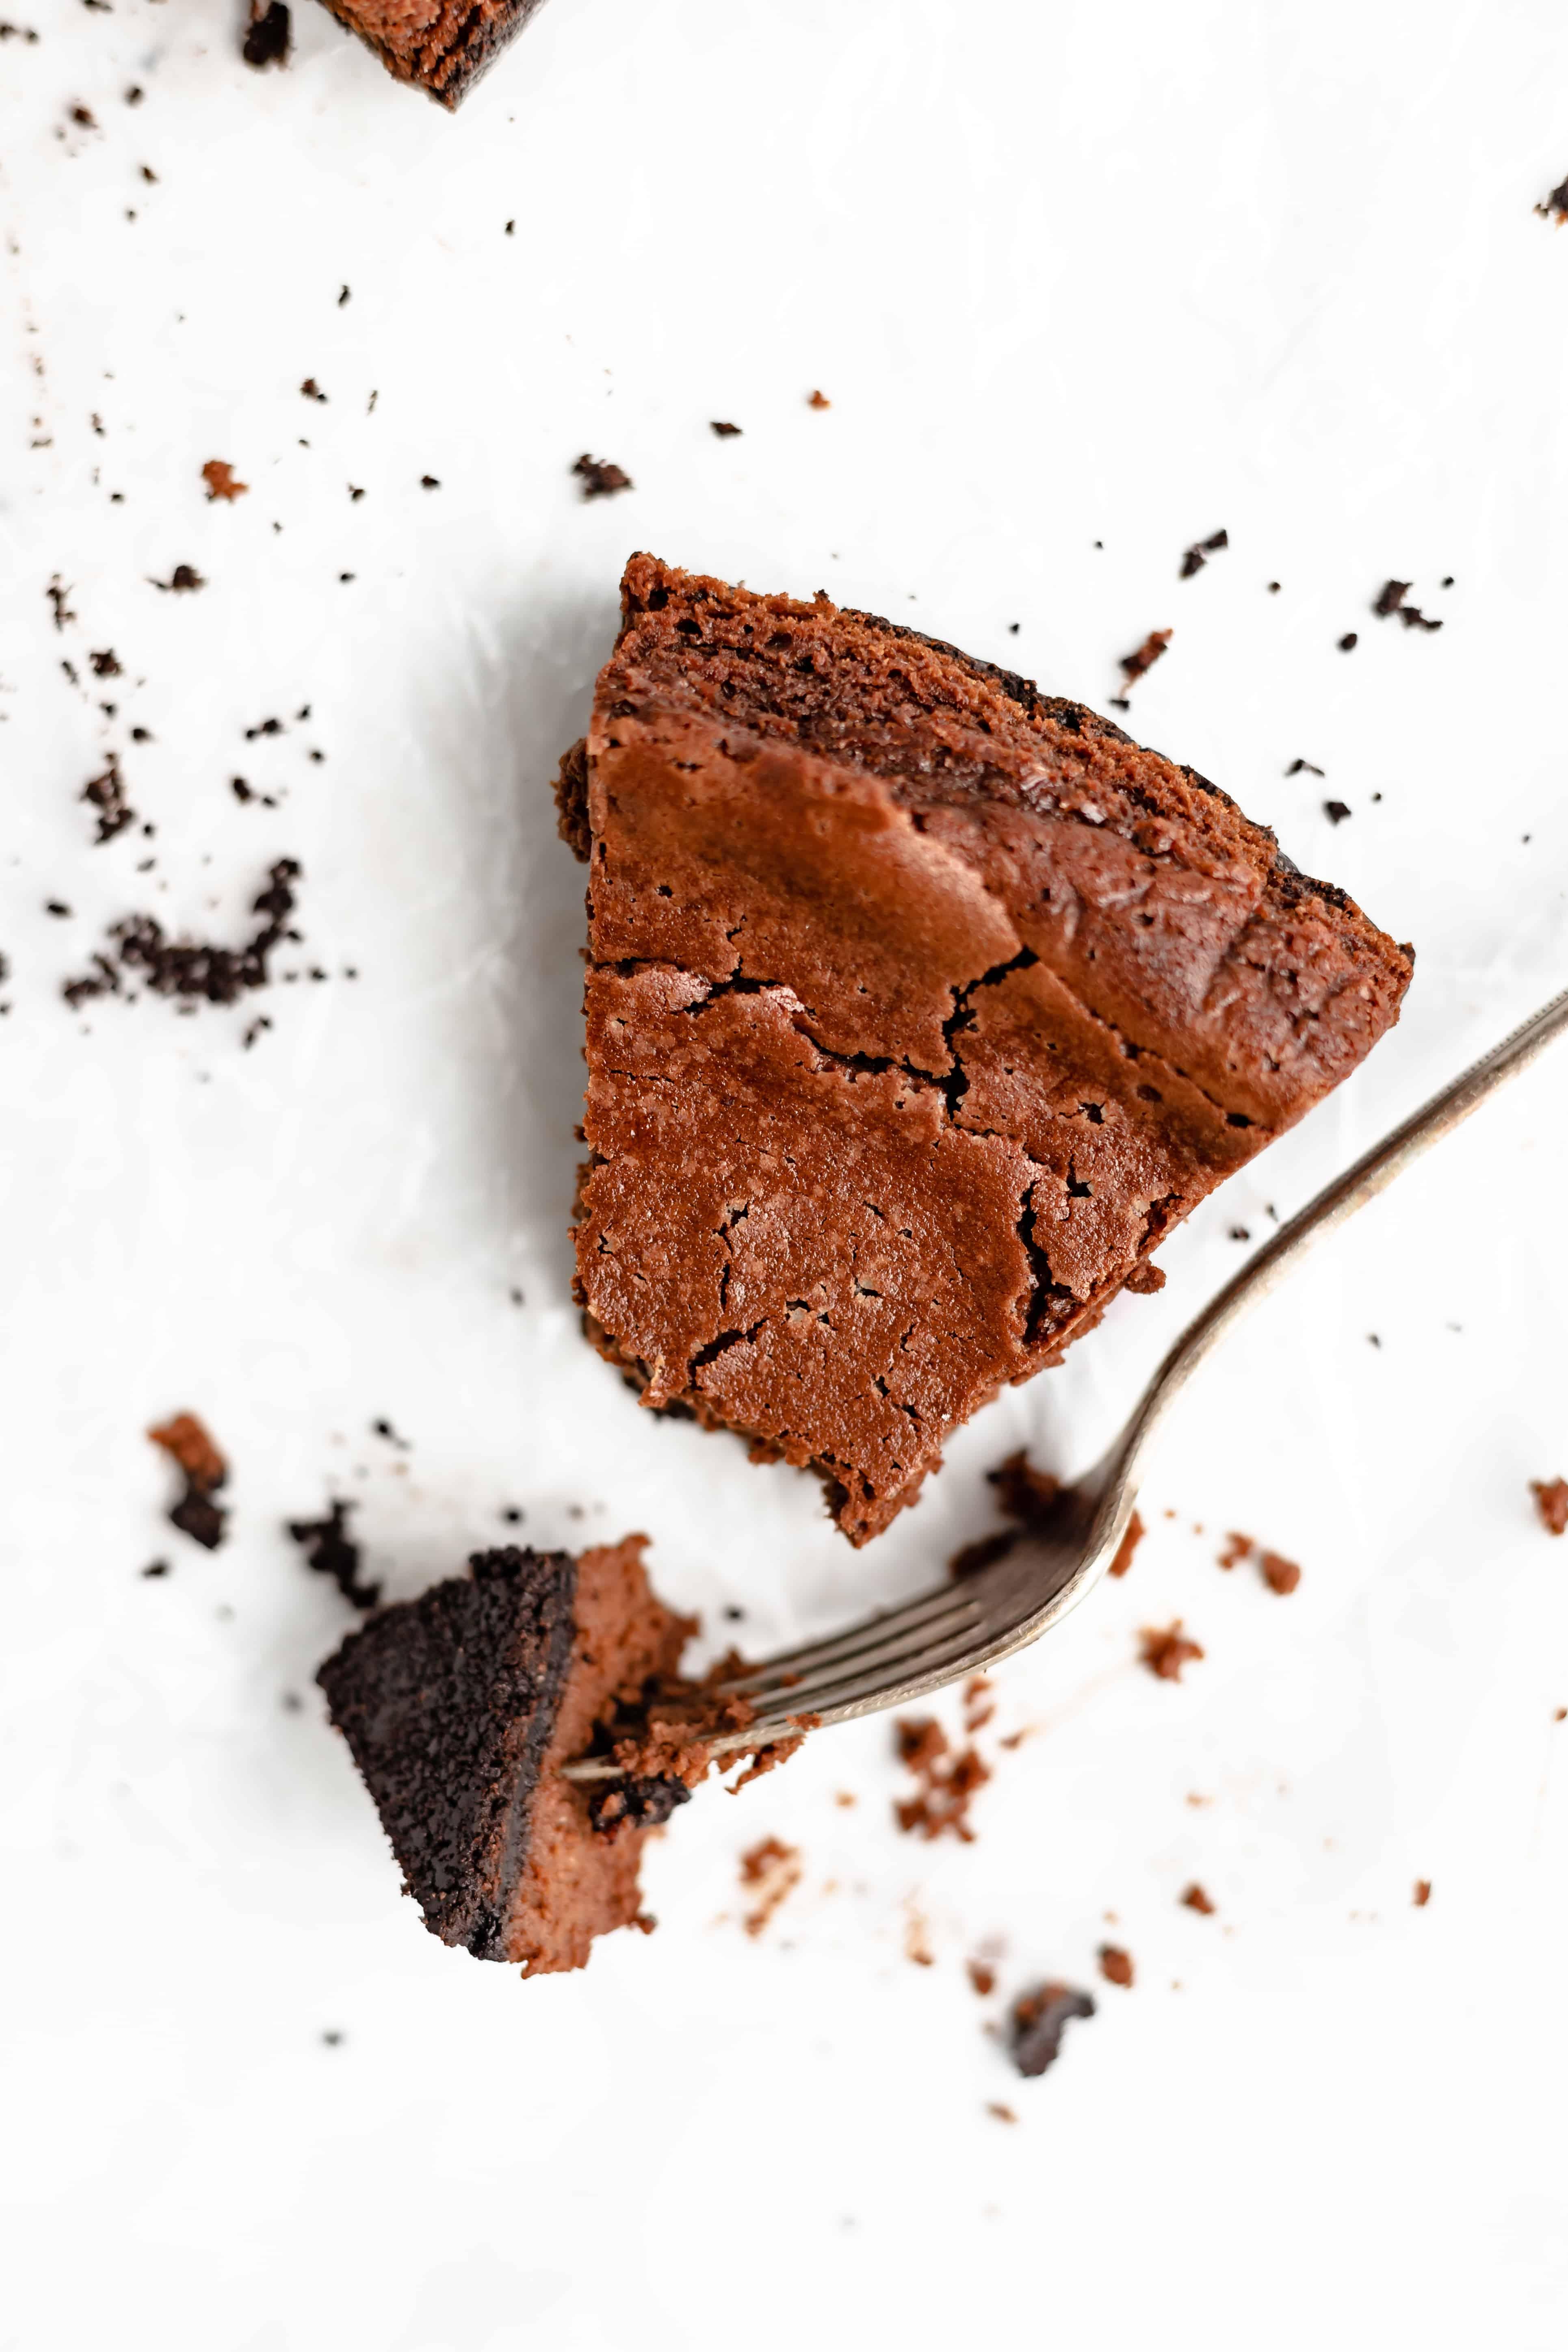 How to Make Chocolate Stout Cheesecake